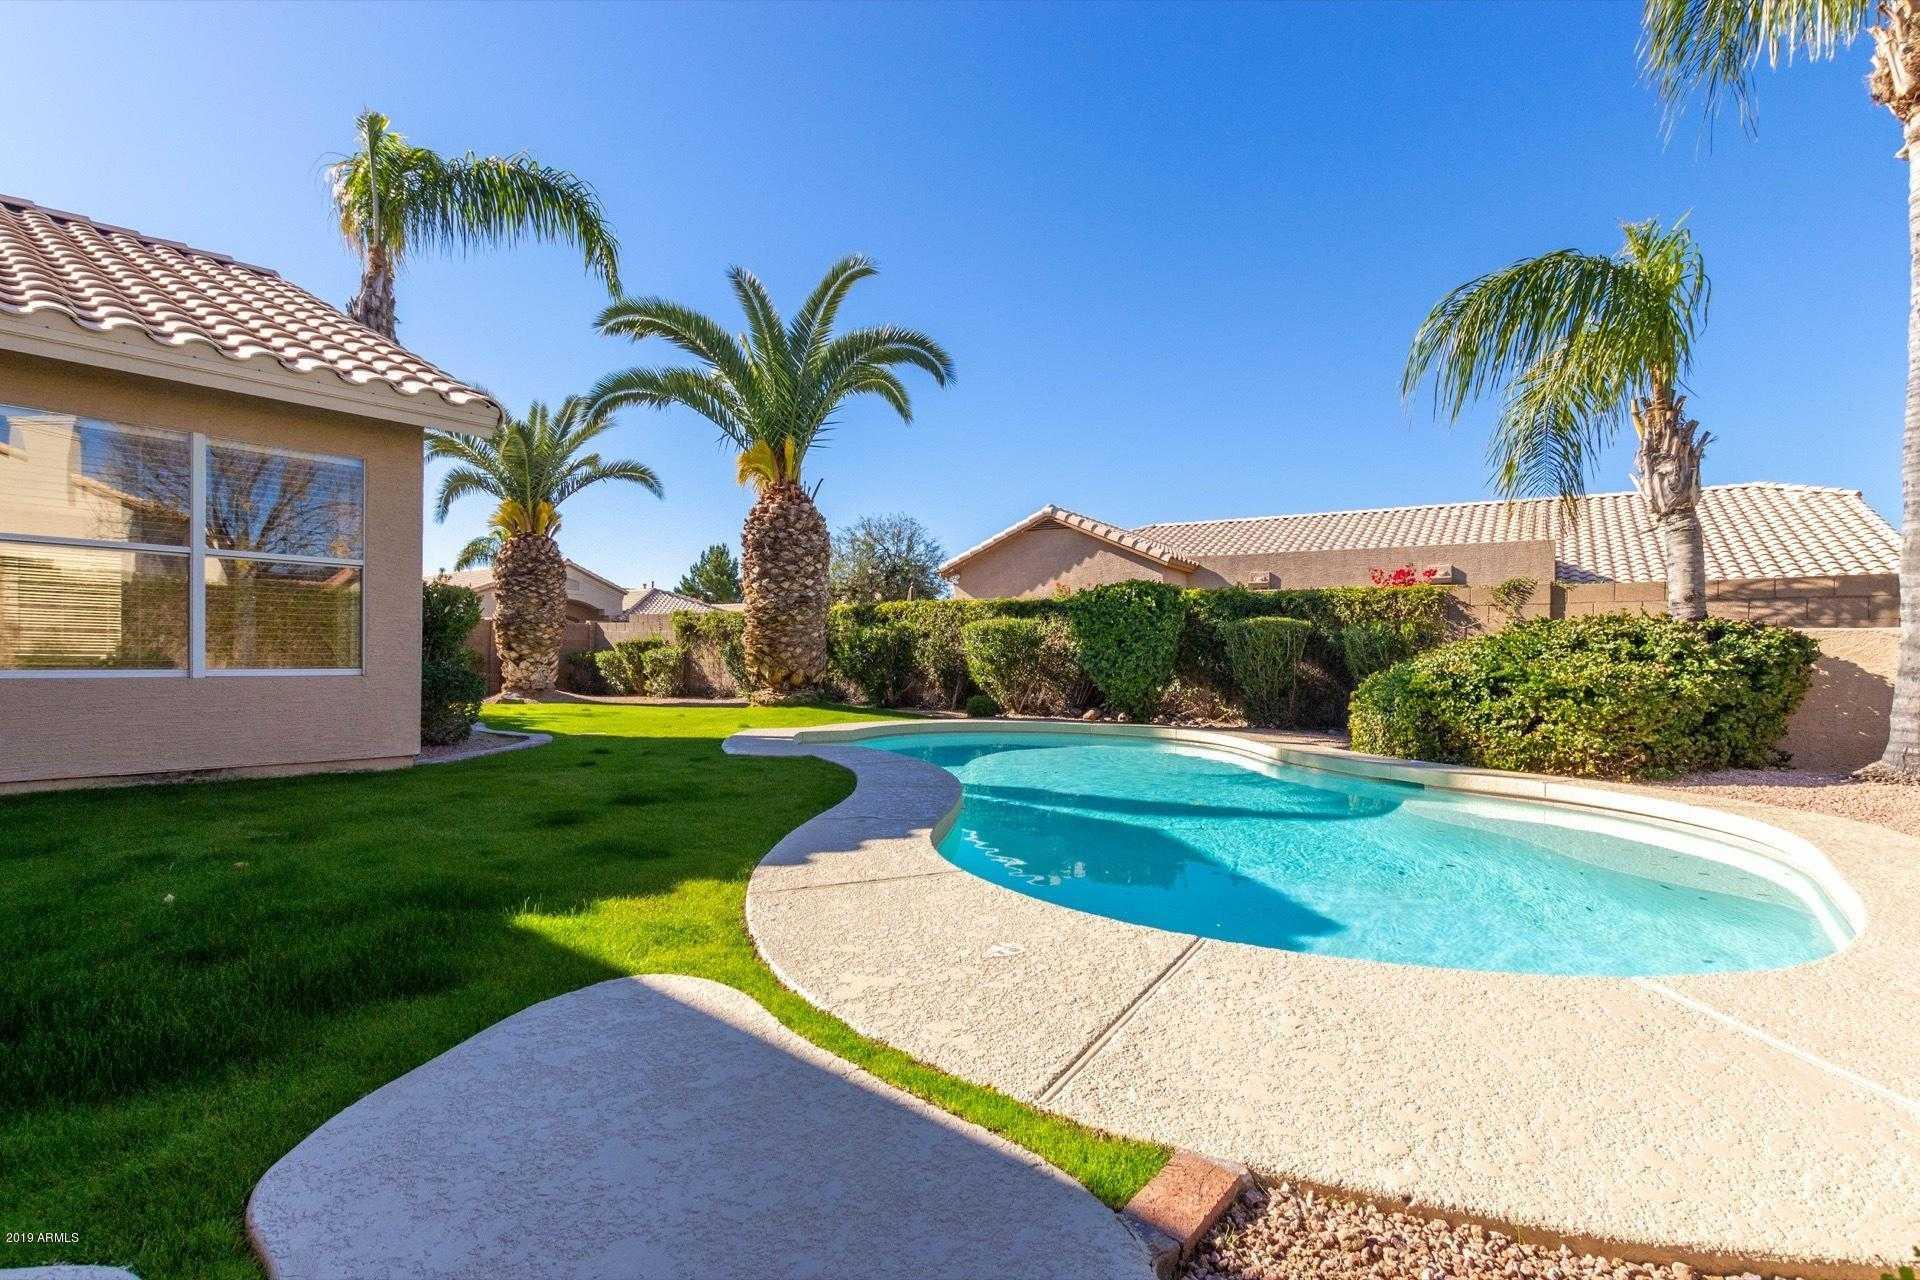 $421,000 - 4Br/2Ba - Home for Sale in Arrowhead Ranch, Glendale